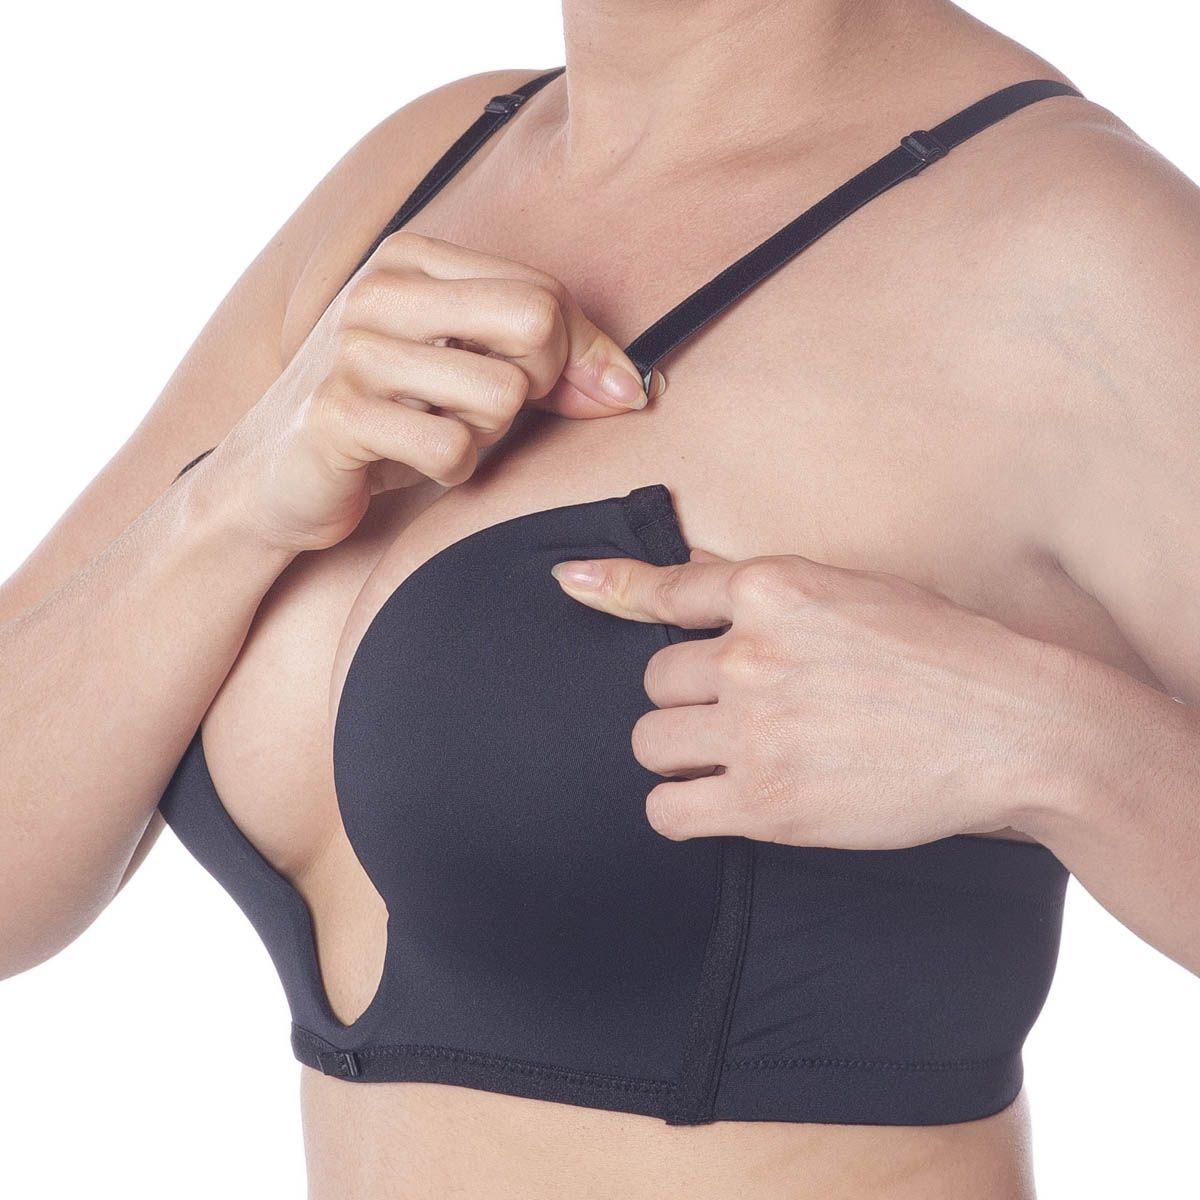 Sutiã decote profundo efeito silicone push up Vi lingerie .